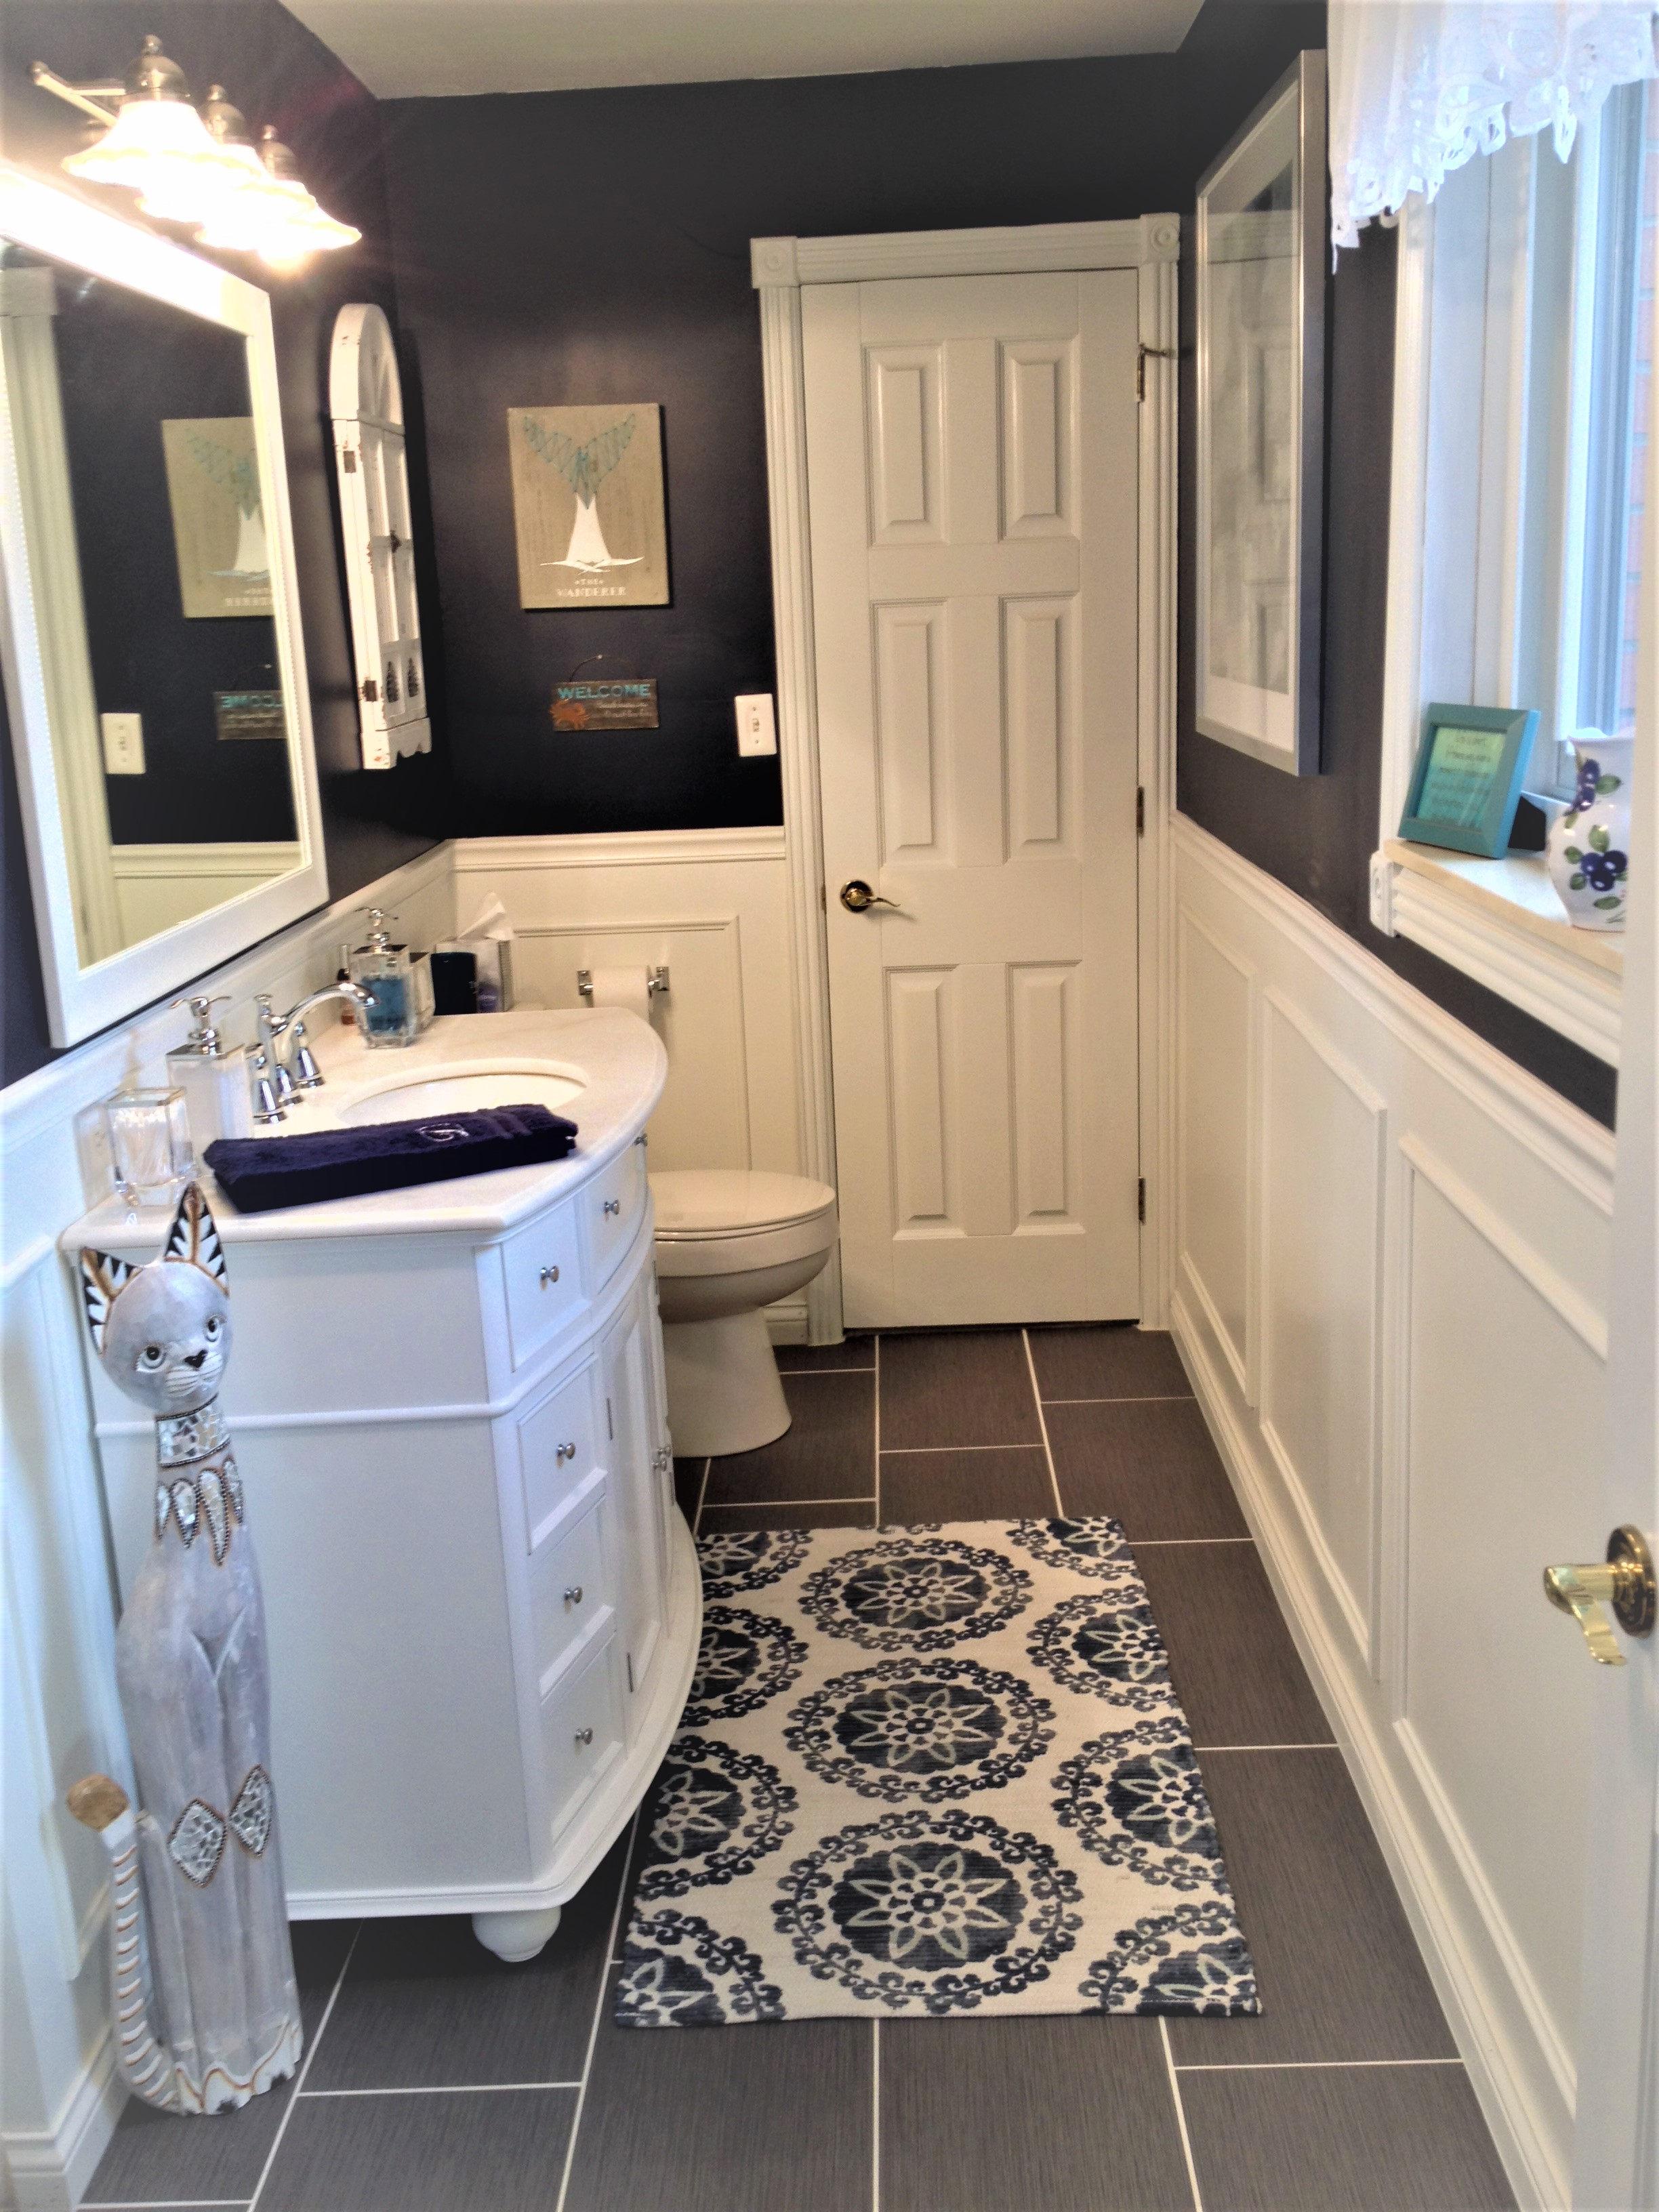 Bathroom on a Budget - Remodelista